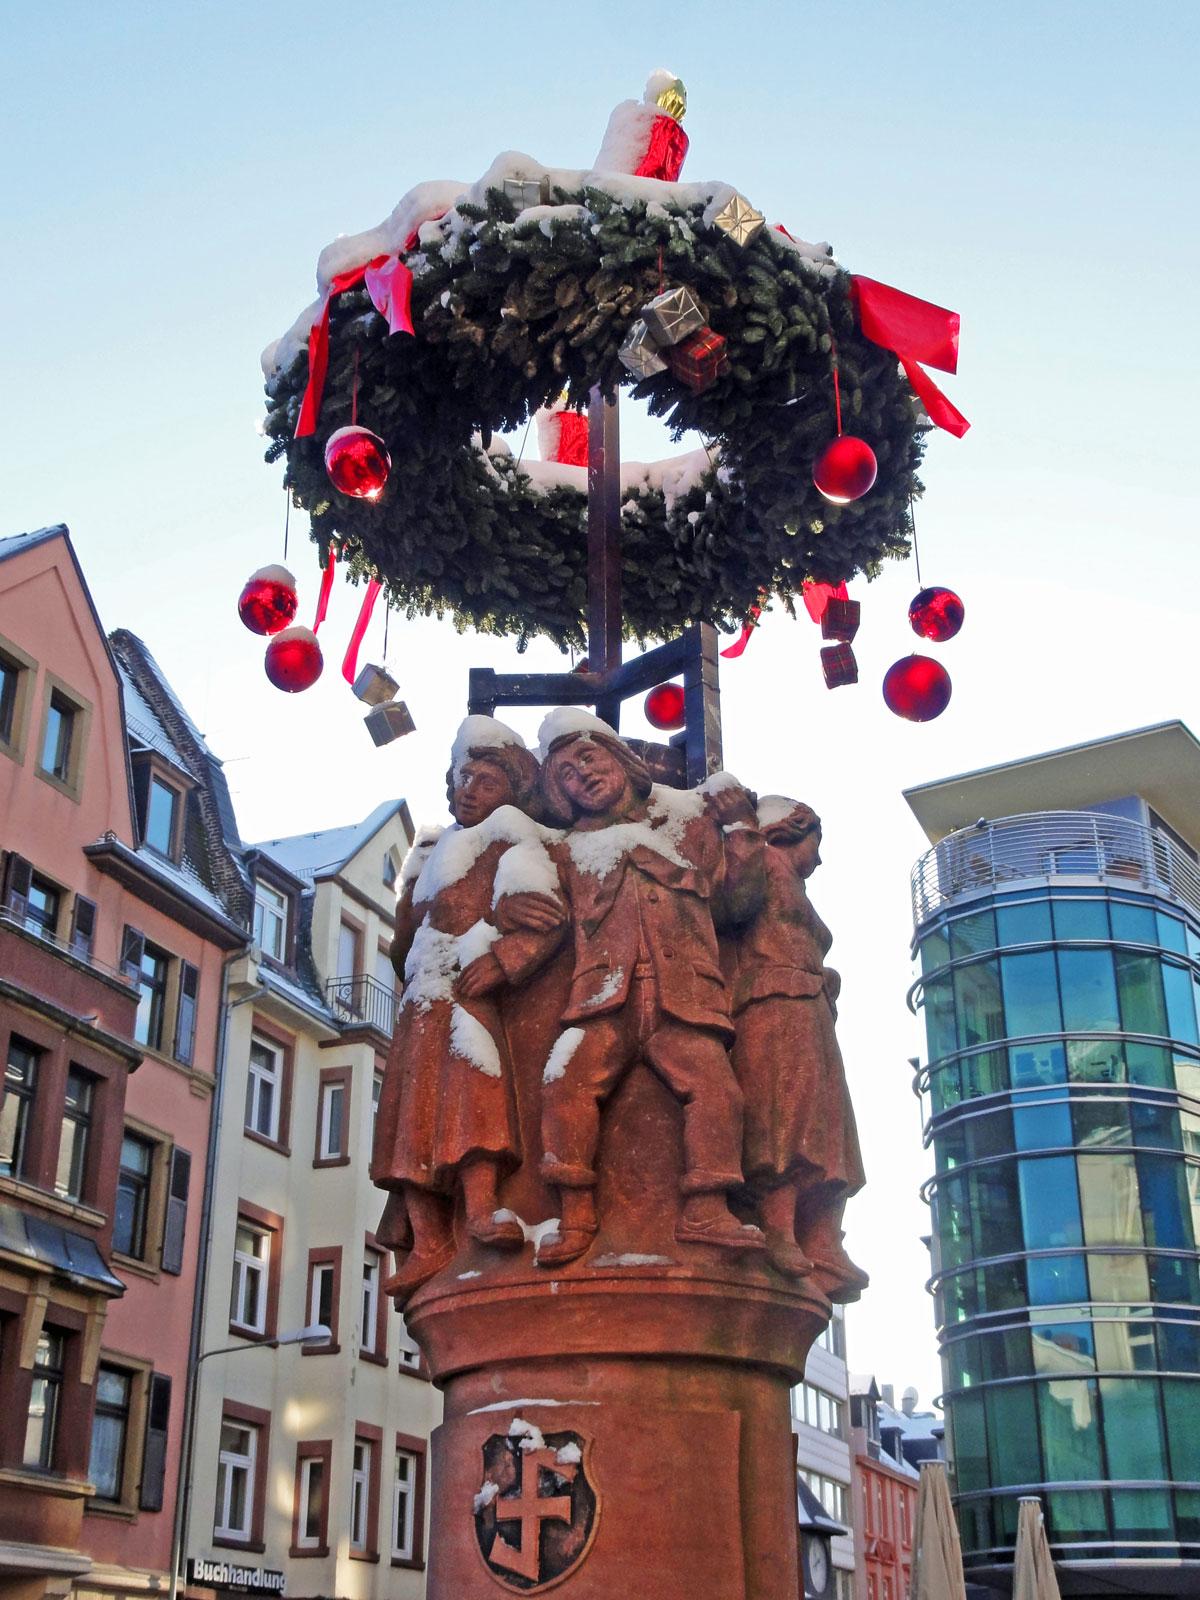 Weihnachtsbeleuchtung Berger Straße